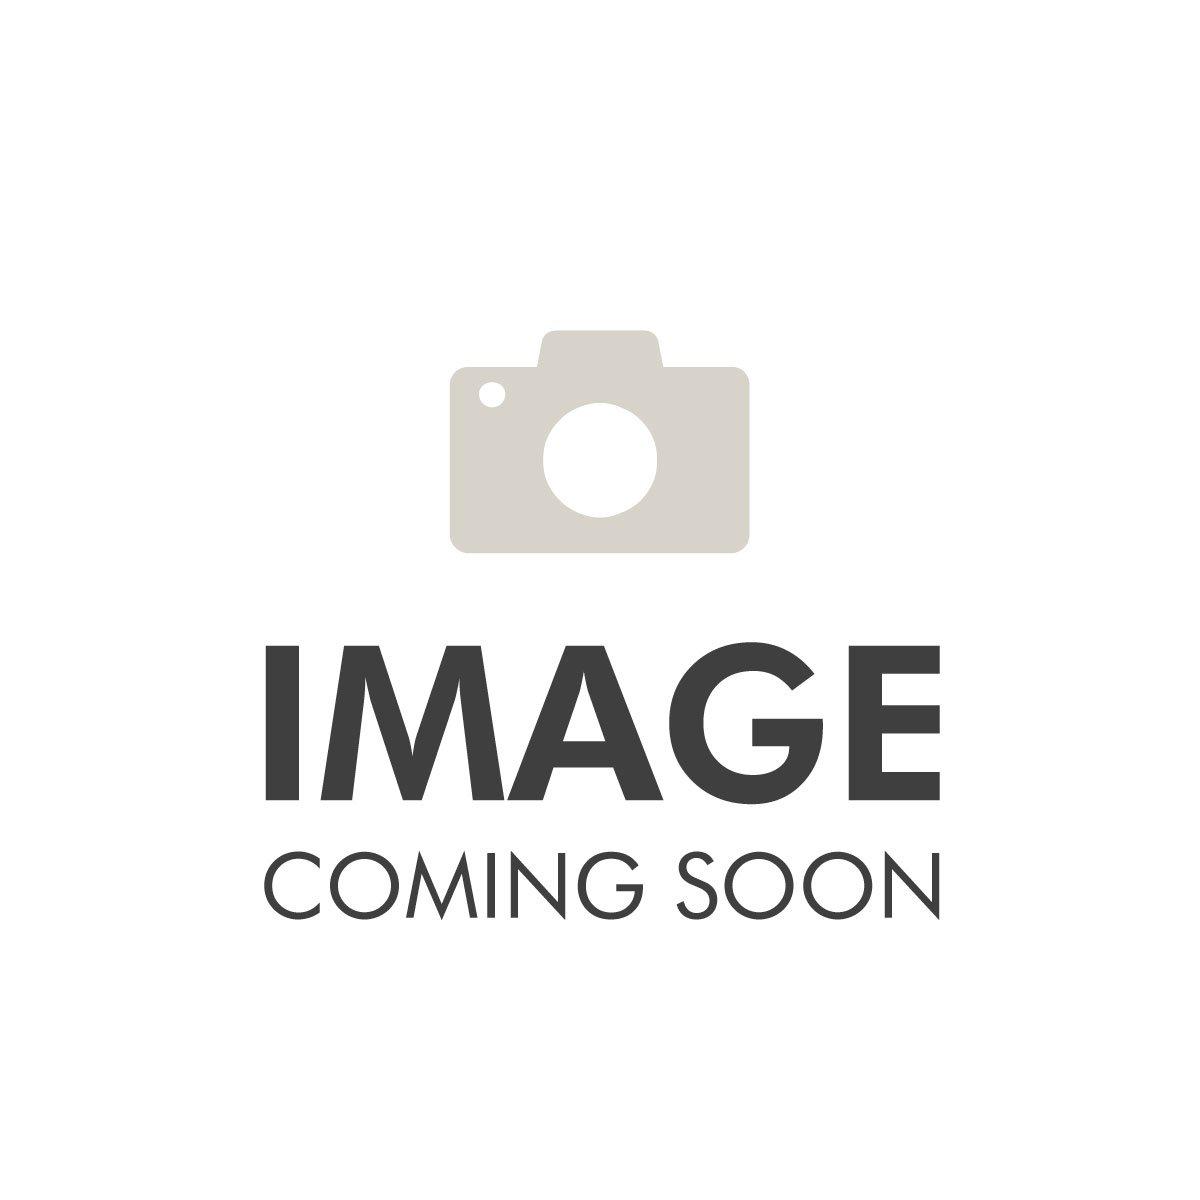 Clarins Blush Prodige Illuminating Cheek Colour 03 Miami Pink